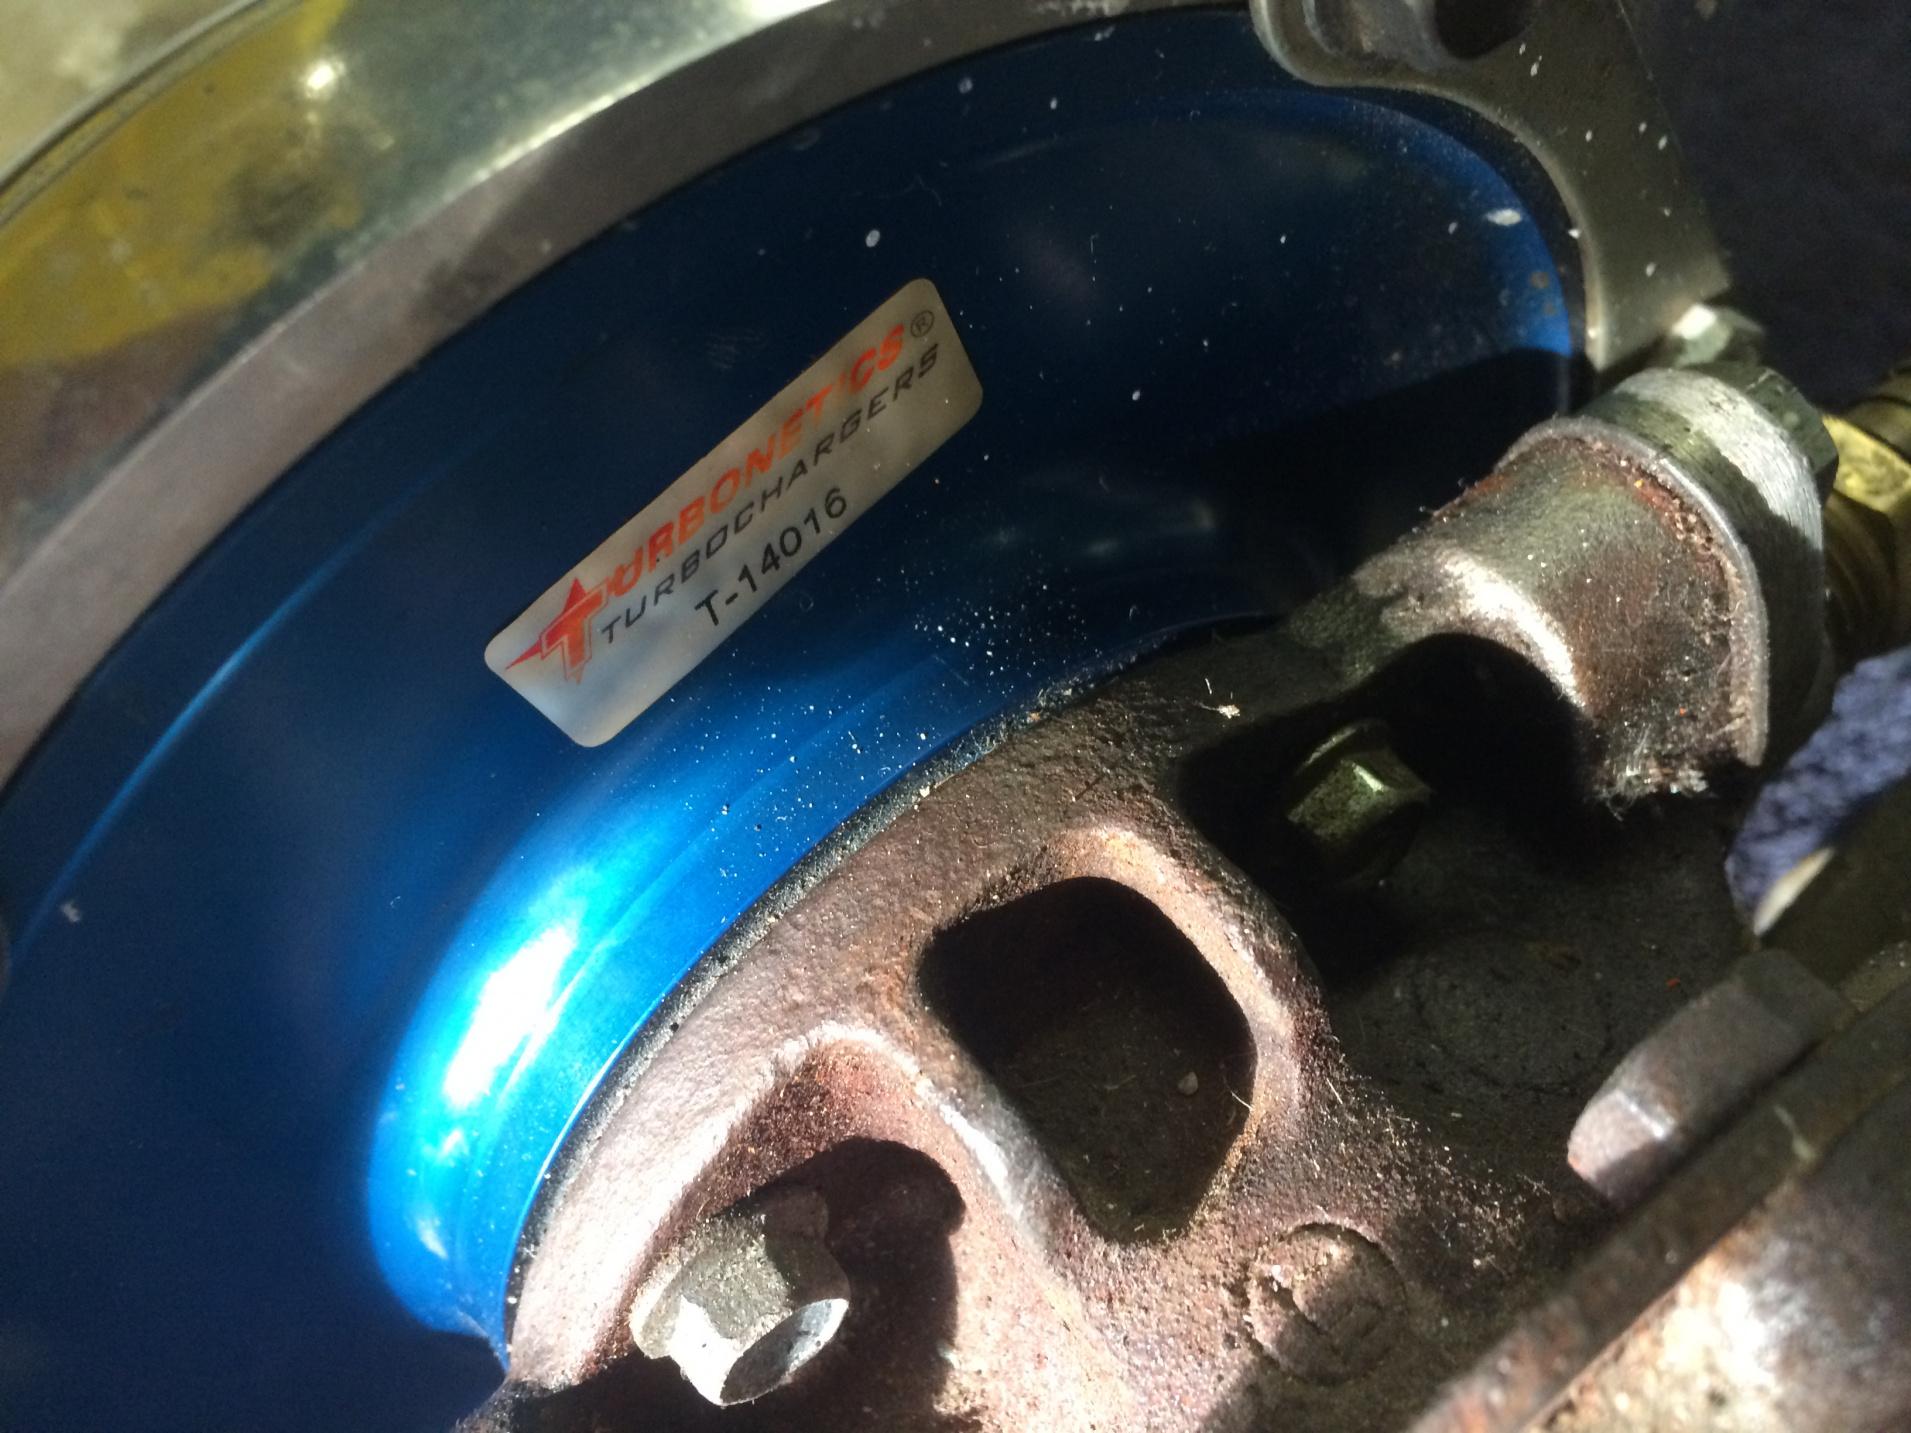 Adapting Roush turbo Kit to SVT-img_1776.jpg